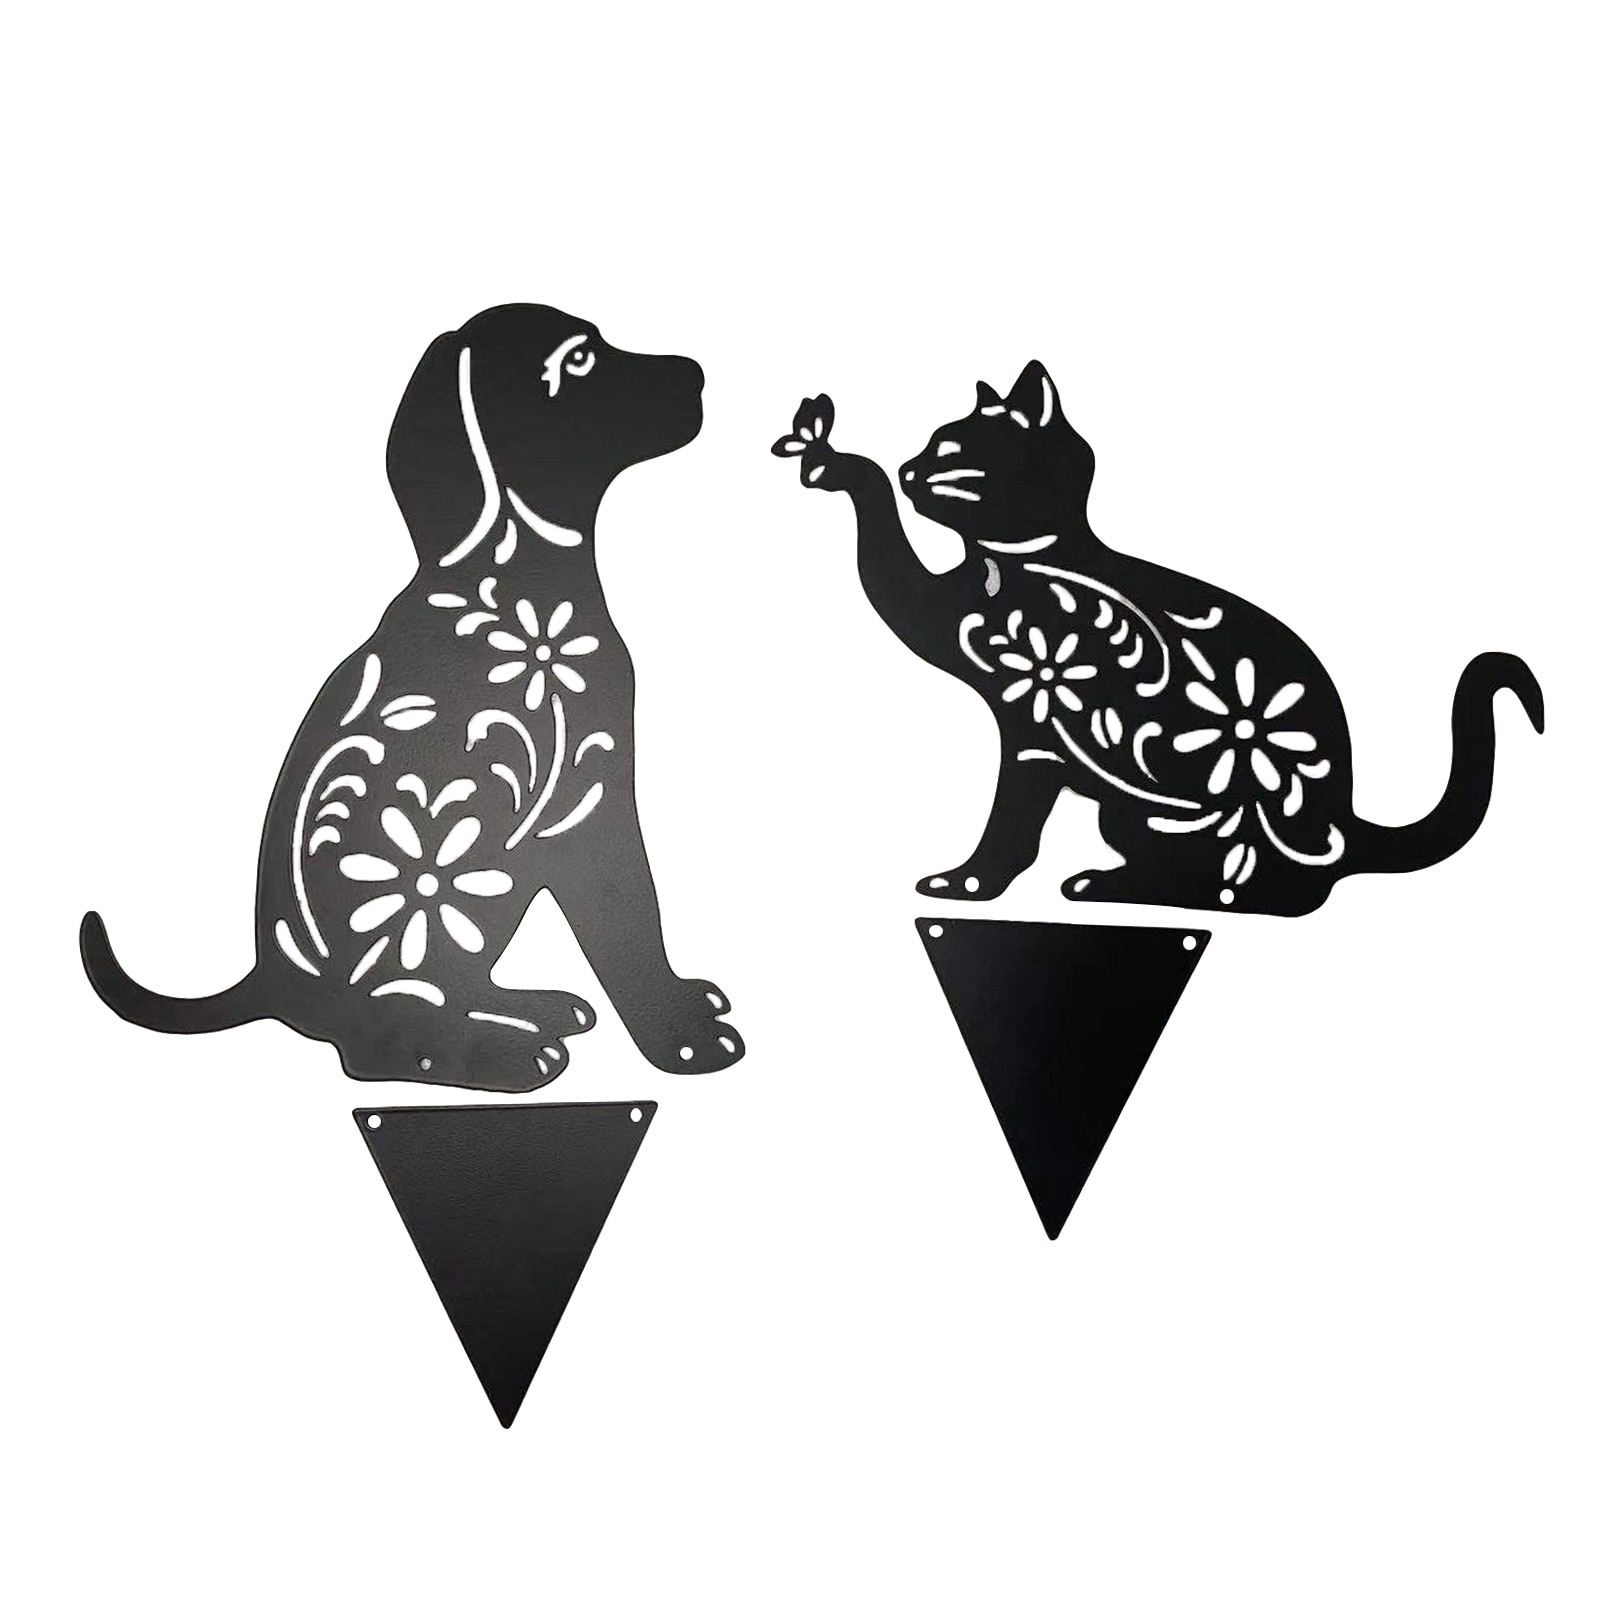 Outdoor METAL CAT DOG HOLLLOW OWT Cat Figure Ground Insert Decoration Manor Lawn Garden Decor Sculpture Hollow Black Iron Cat